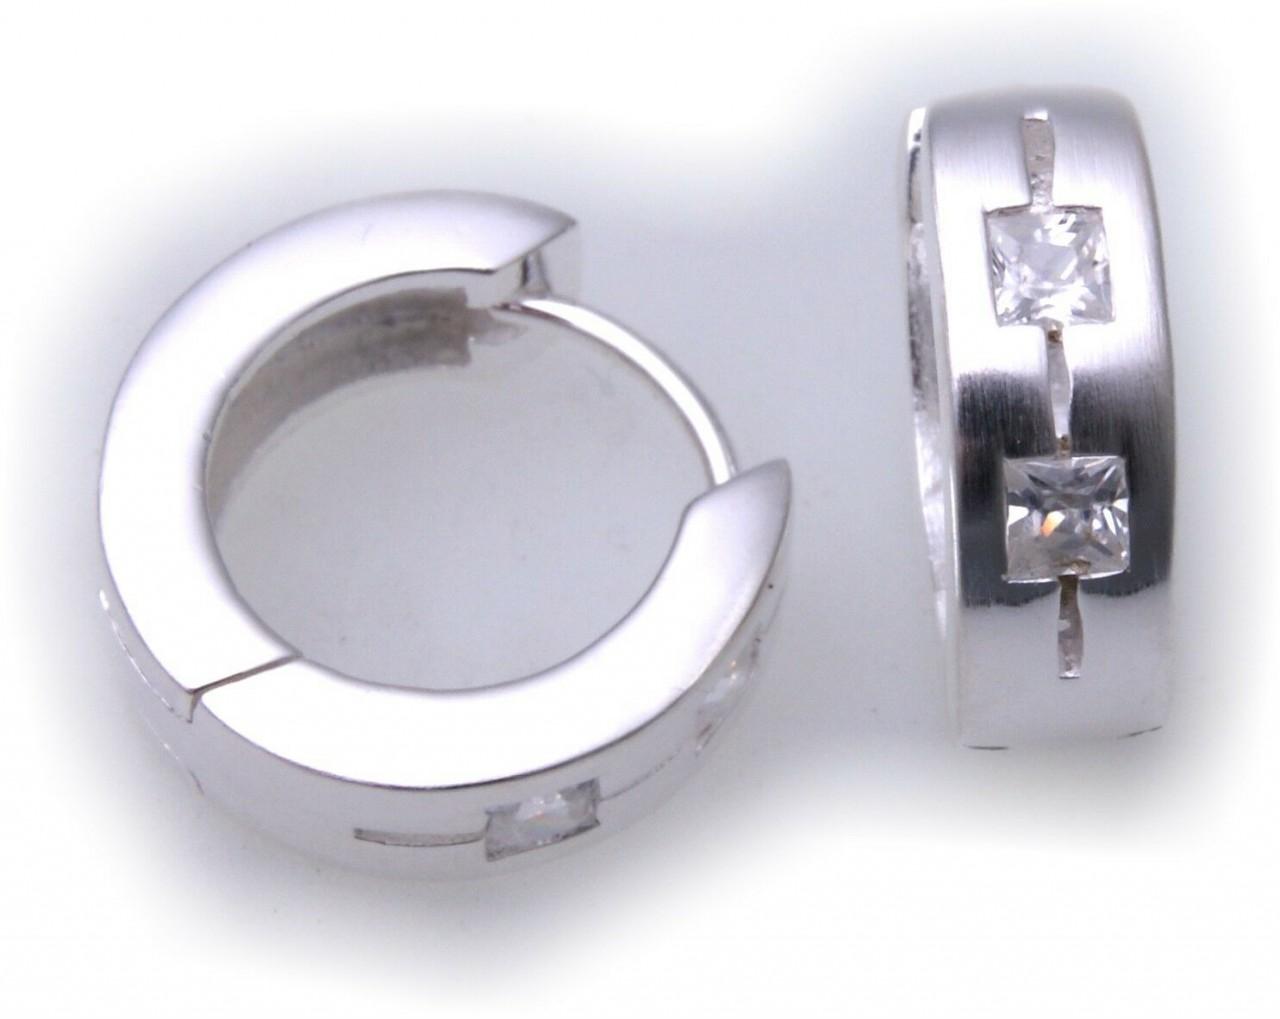 edle Ohrringe Klapp Creolen Zirkonia echt Silber 925 Sterlingsilber BE6763 ZI